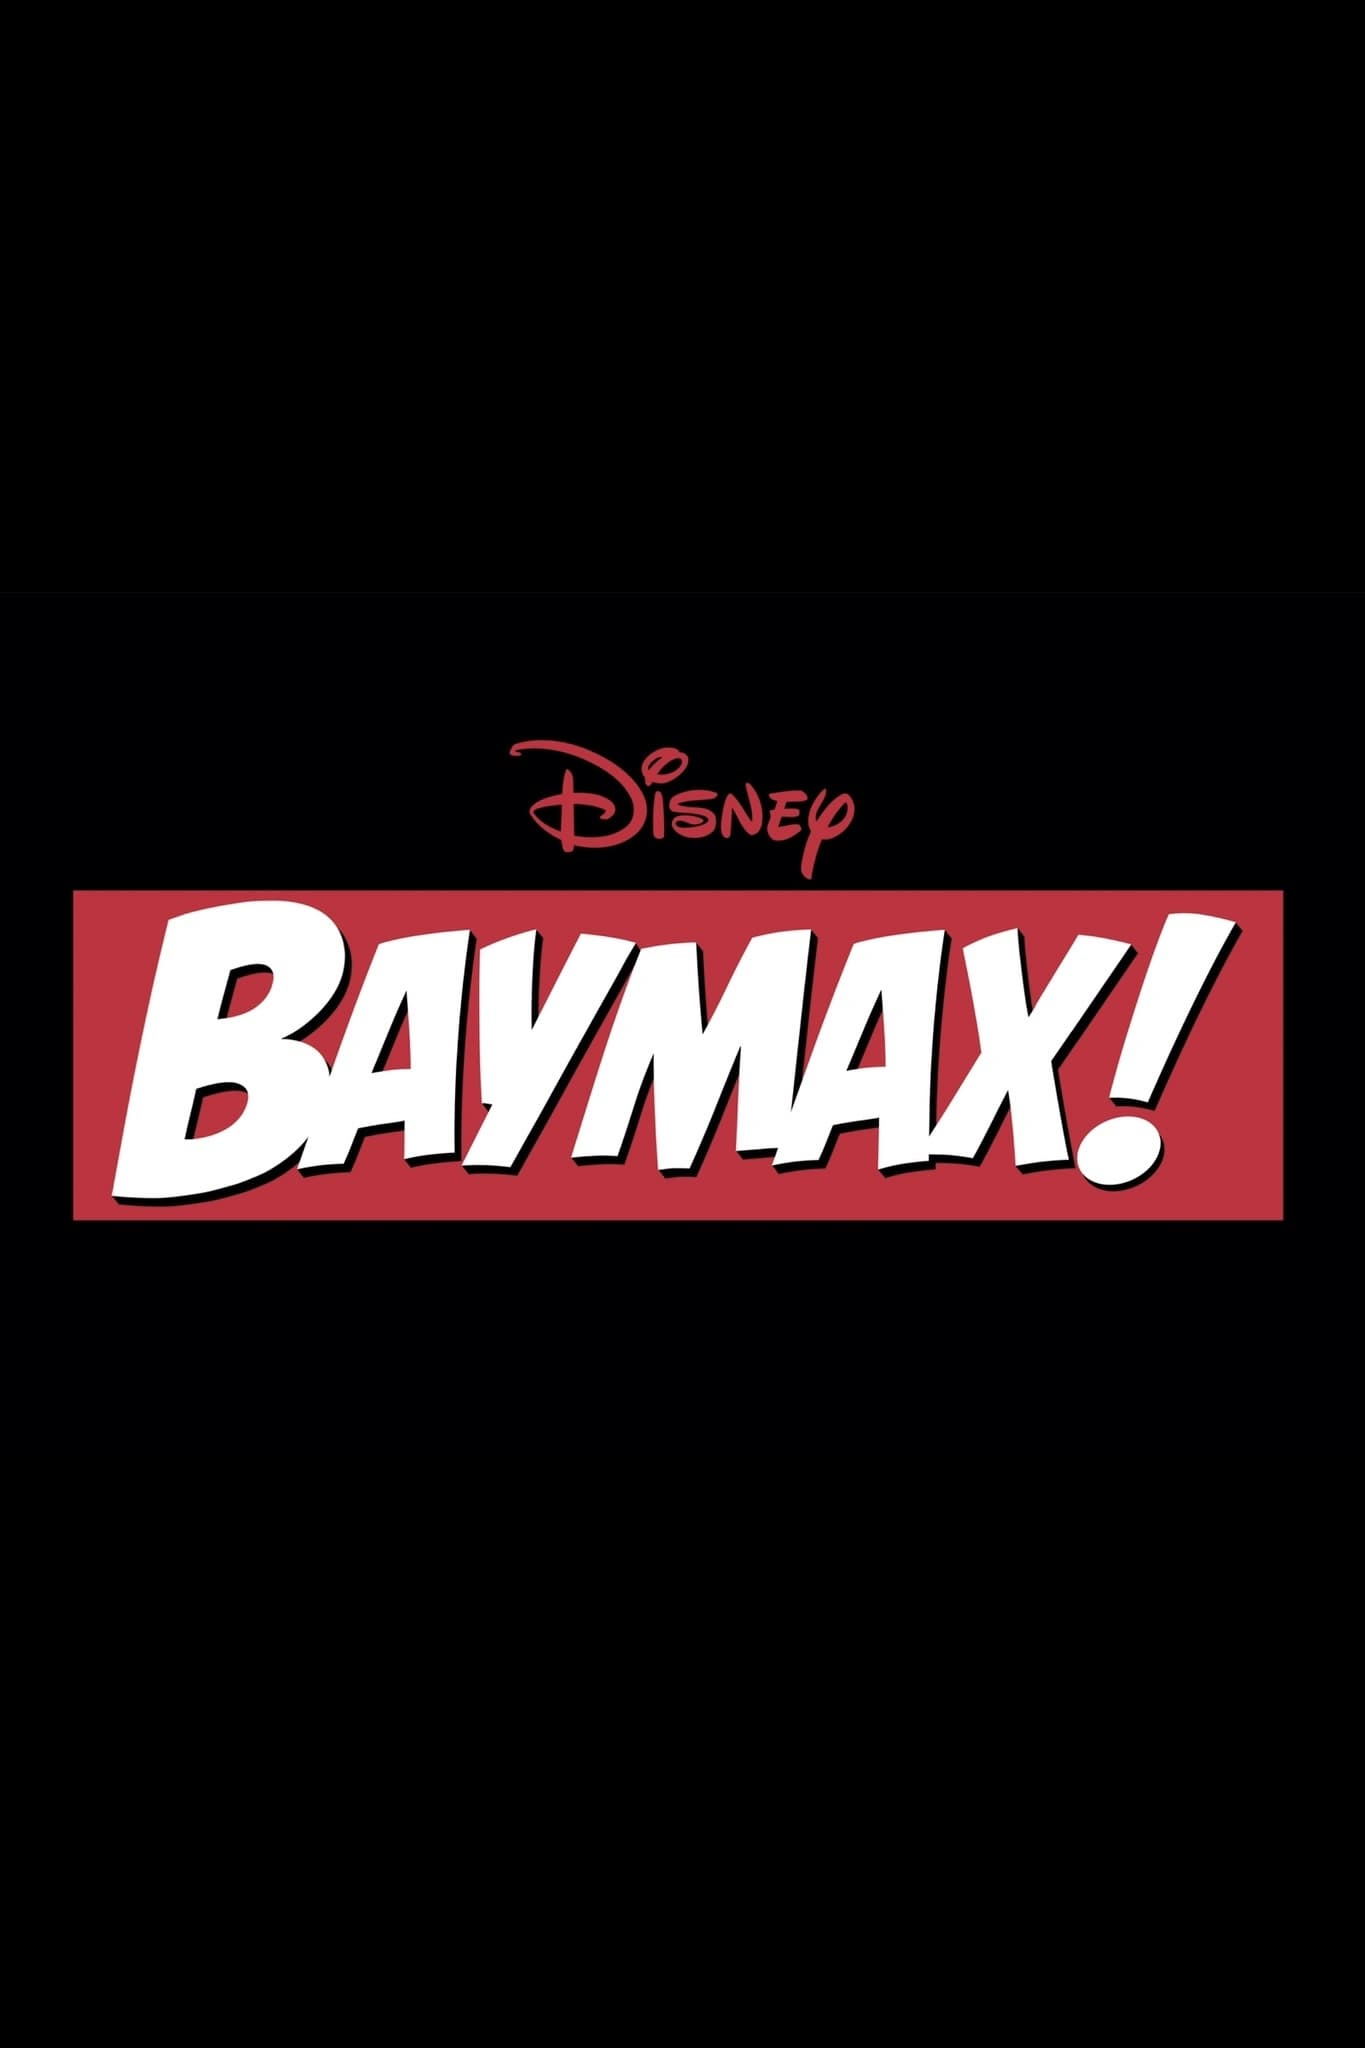 Baymax!